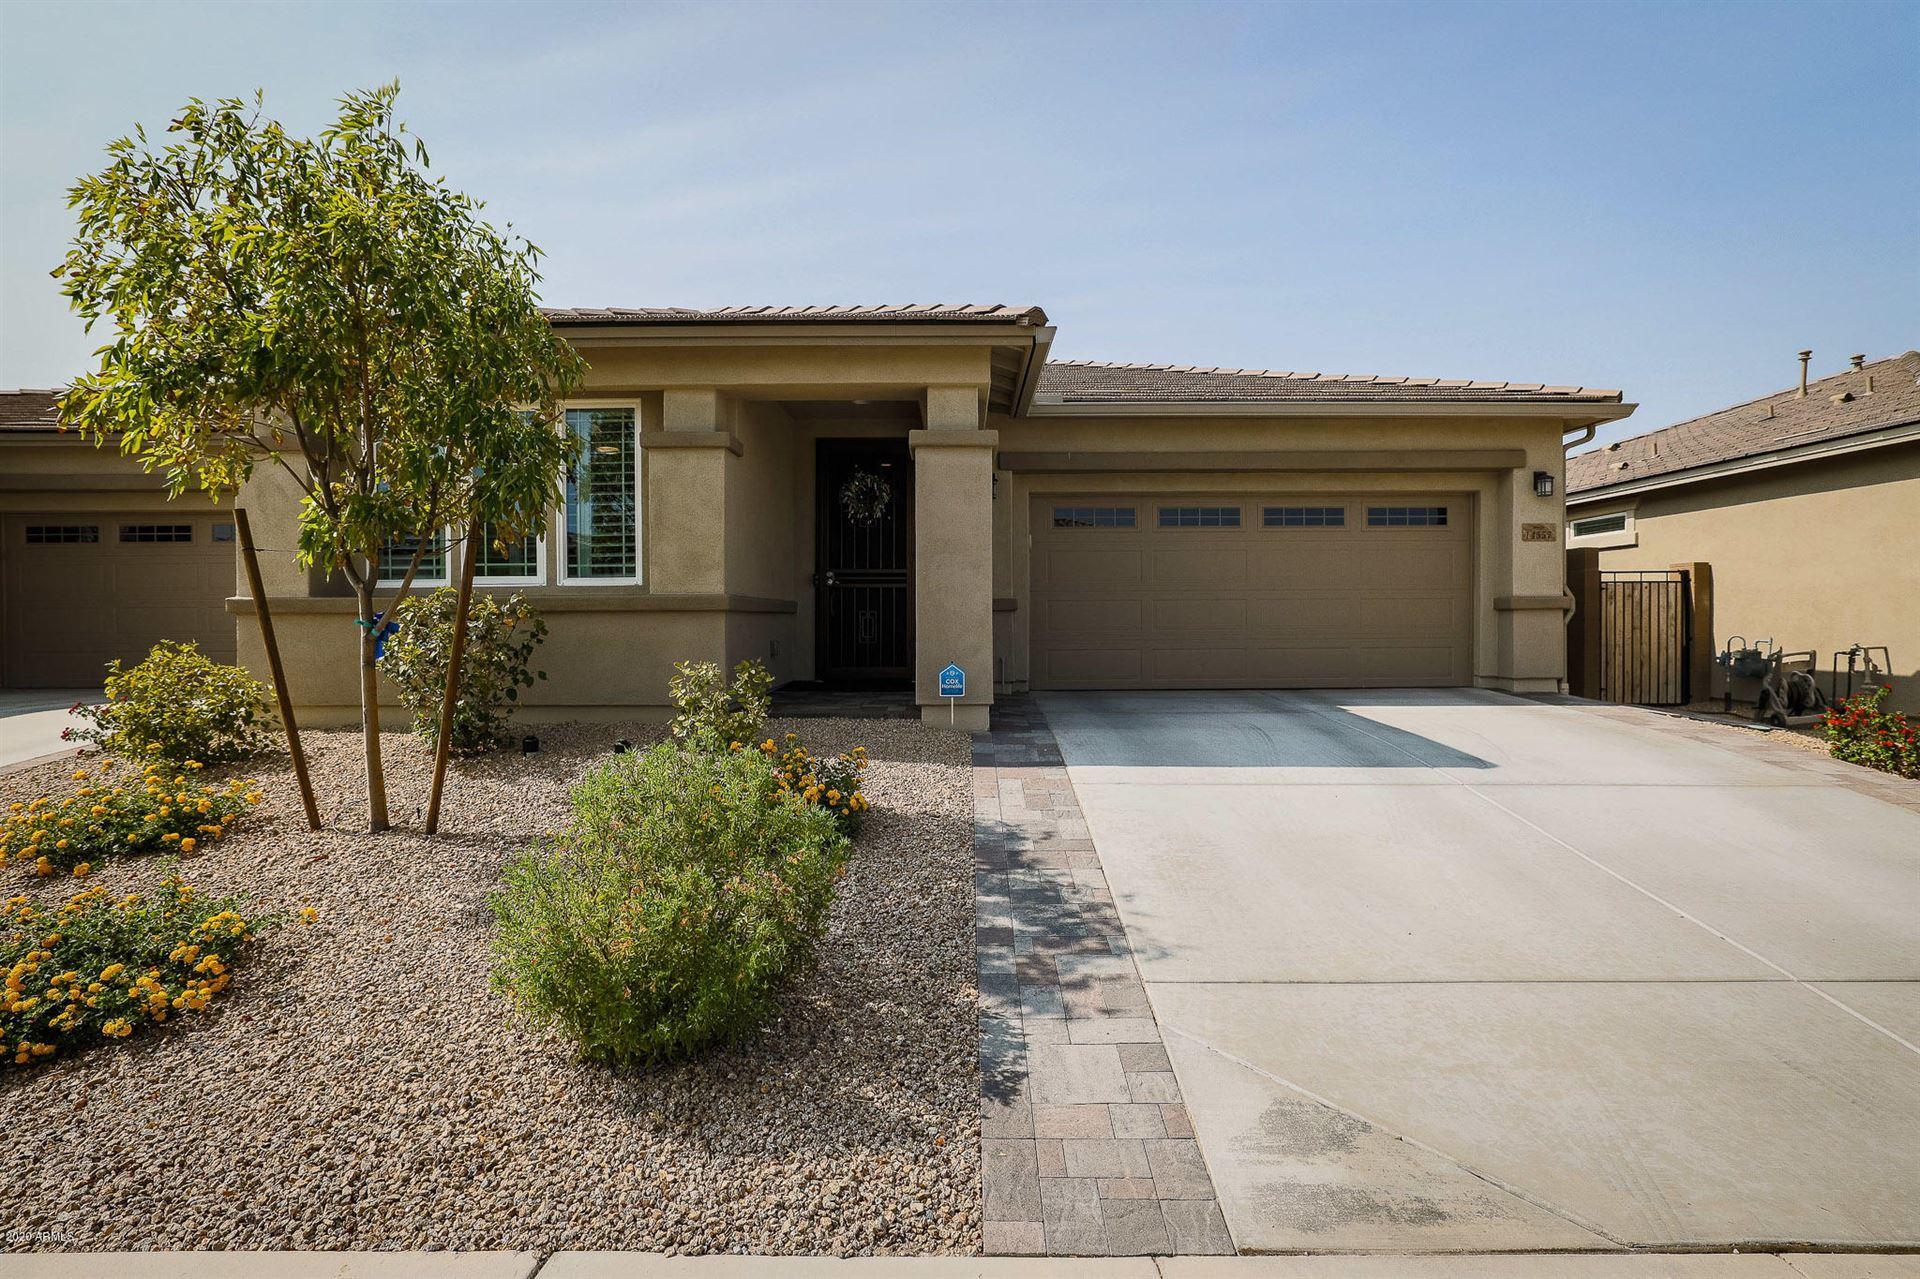 14557 W READE Avenue, Litchfield Park, AZ 85340 - MLS#: 6112397